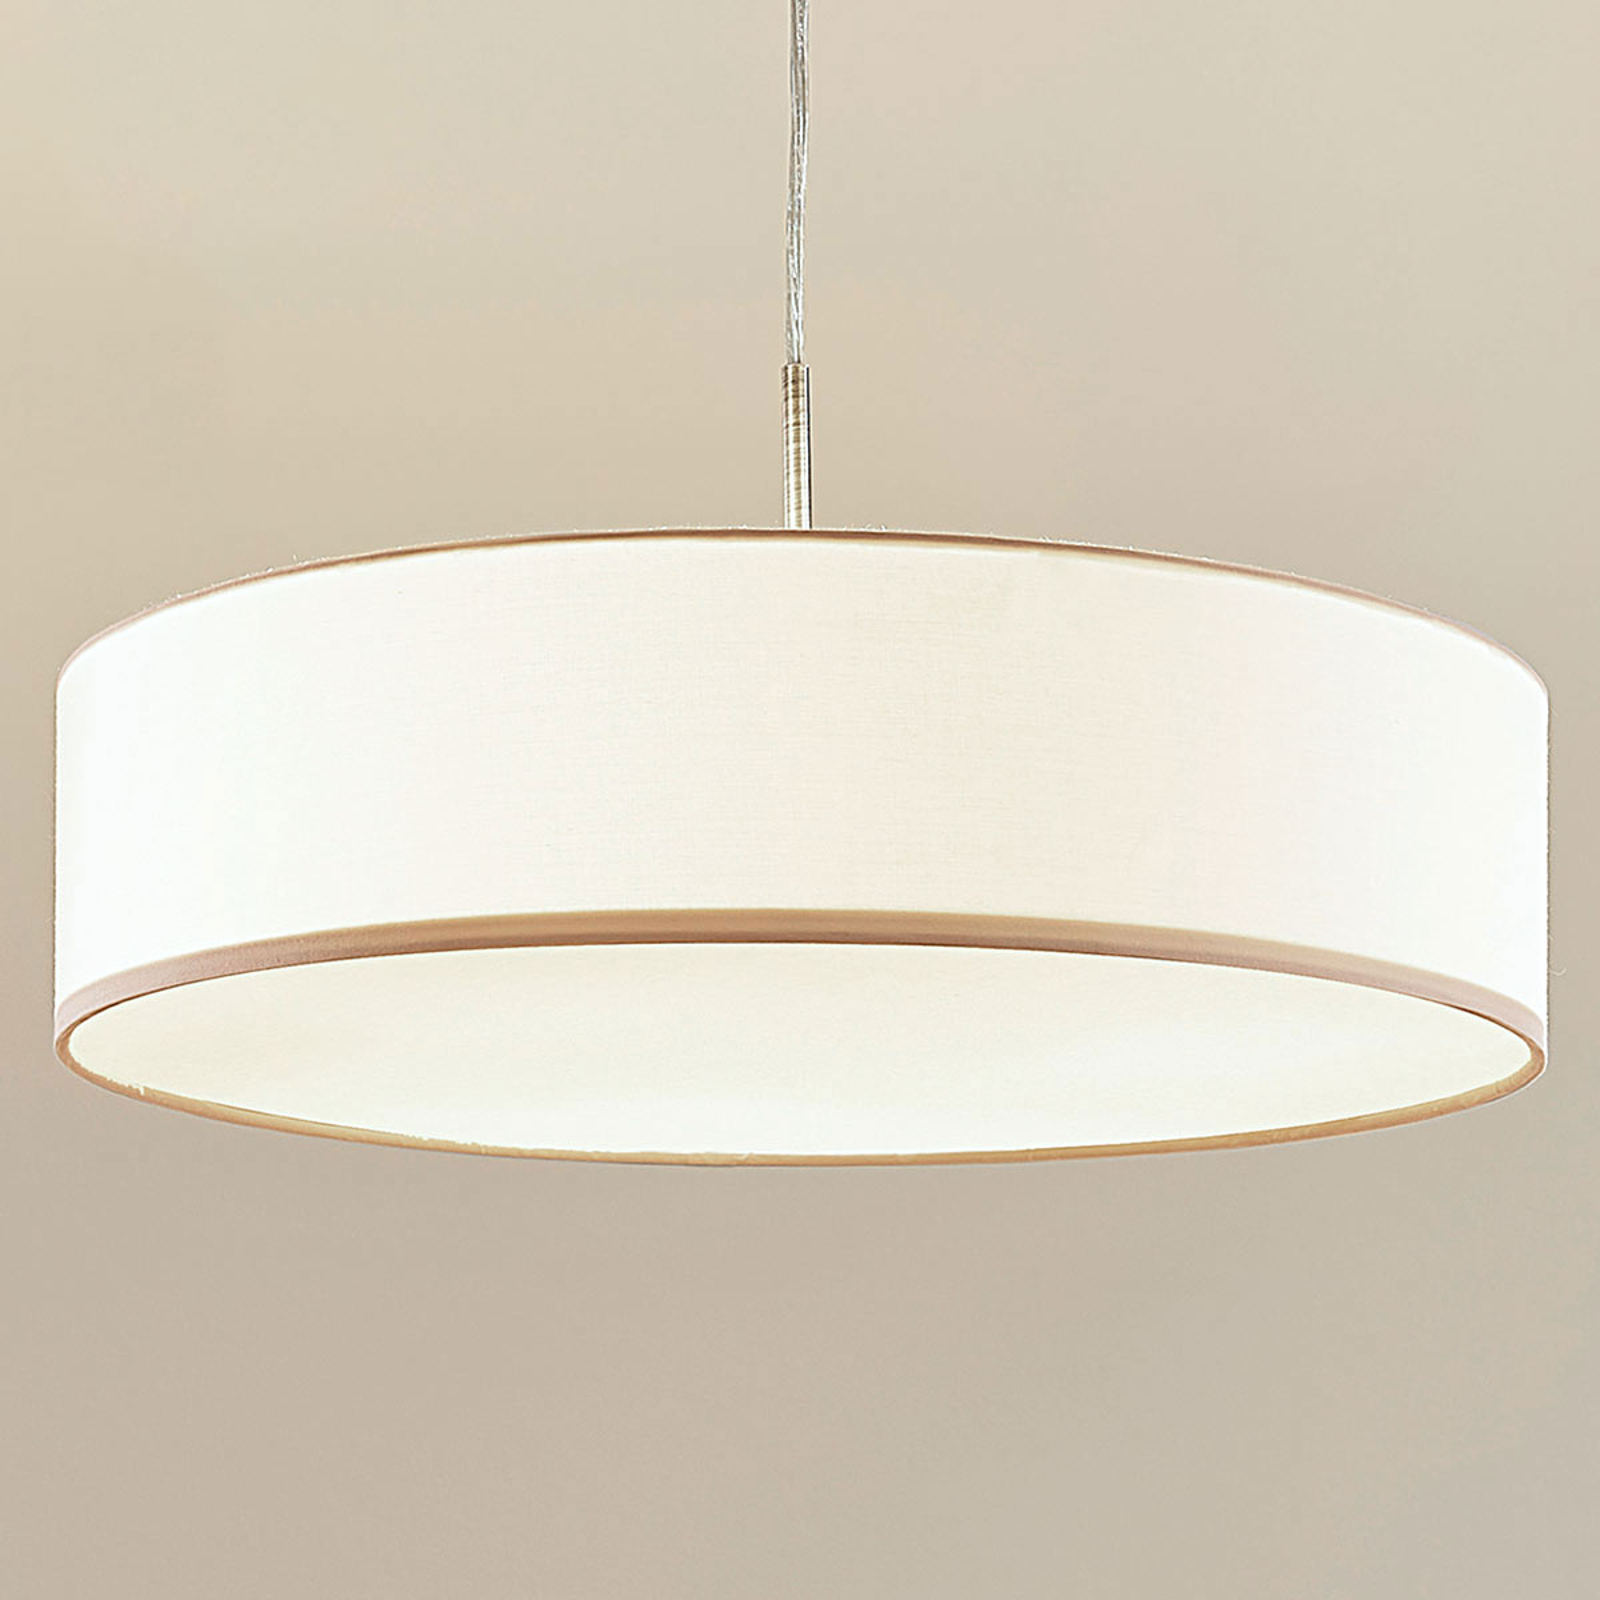 Hängeleuchte Sebatin mit E27-LED, 50 cm, creme